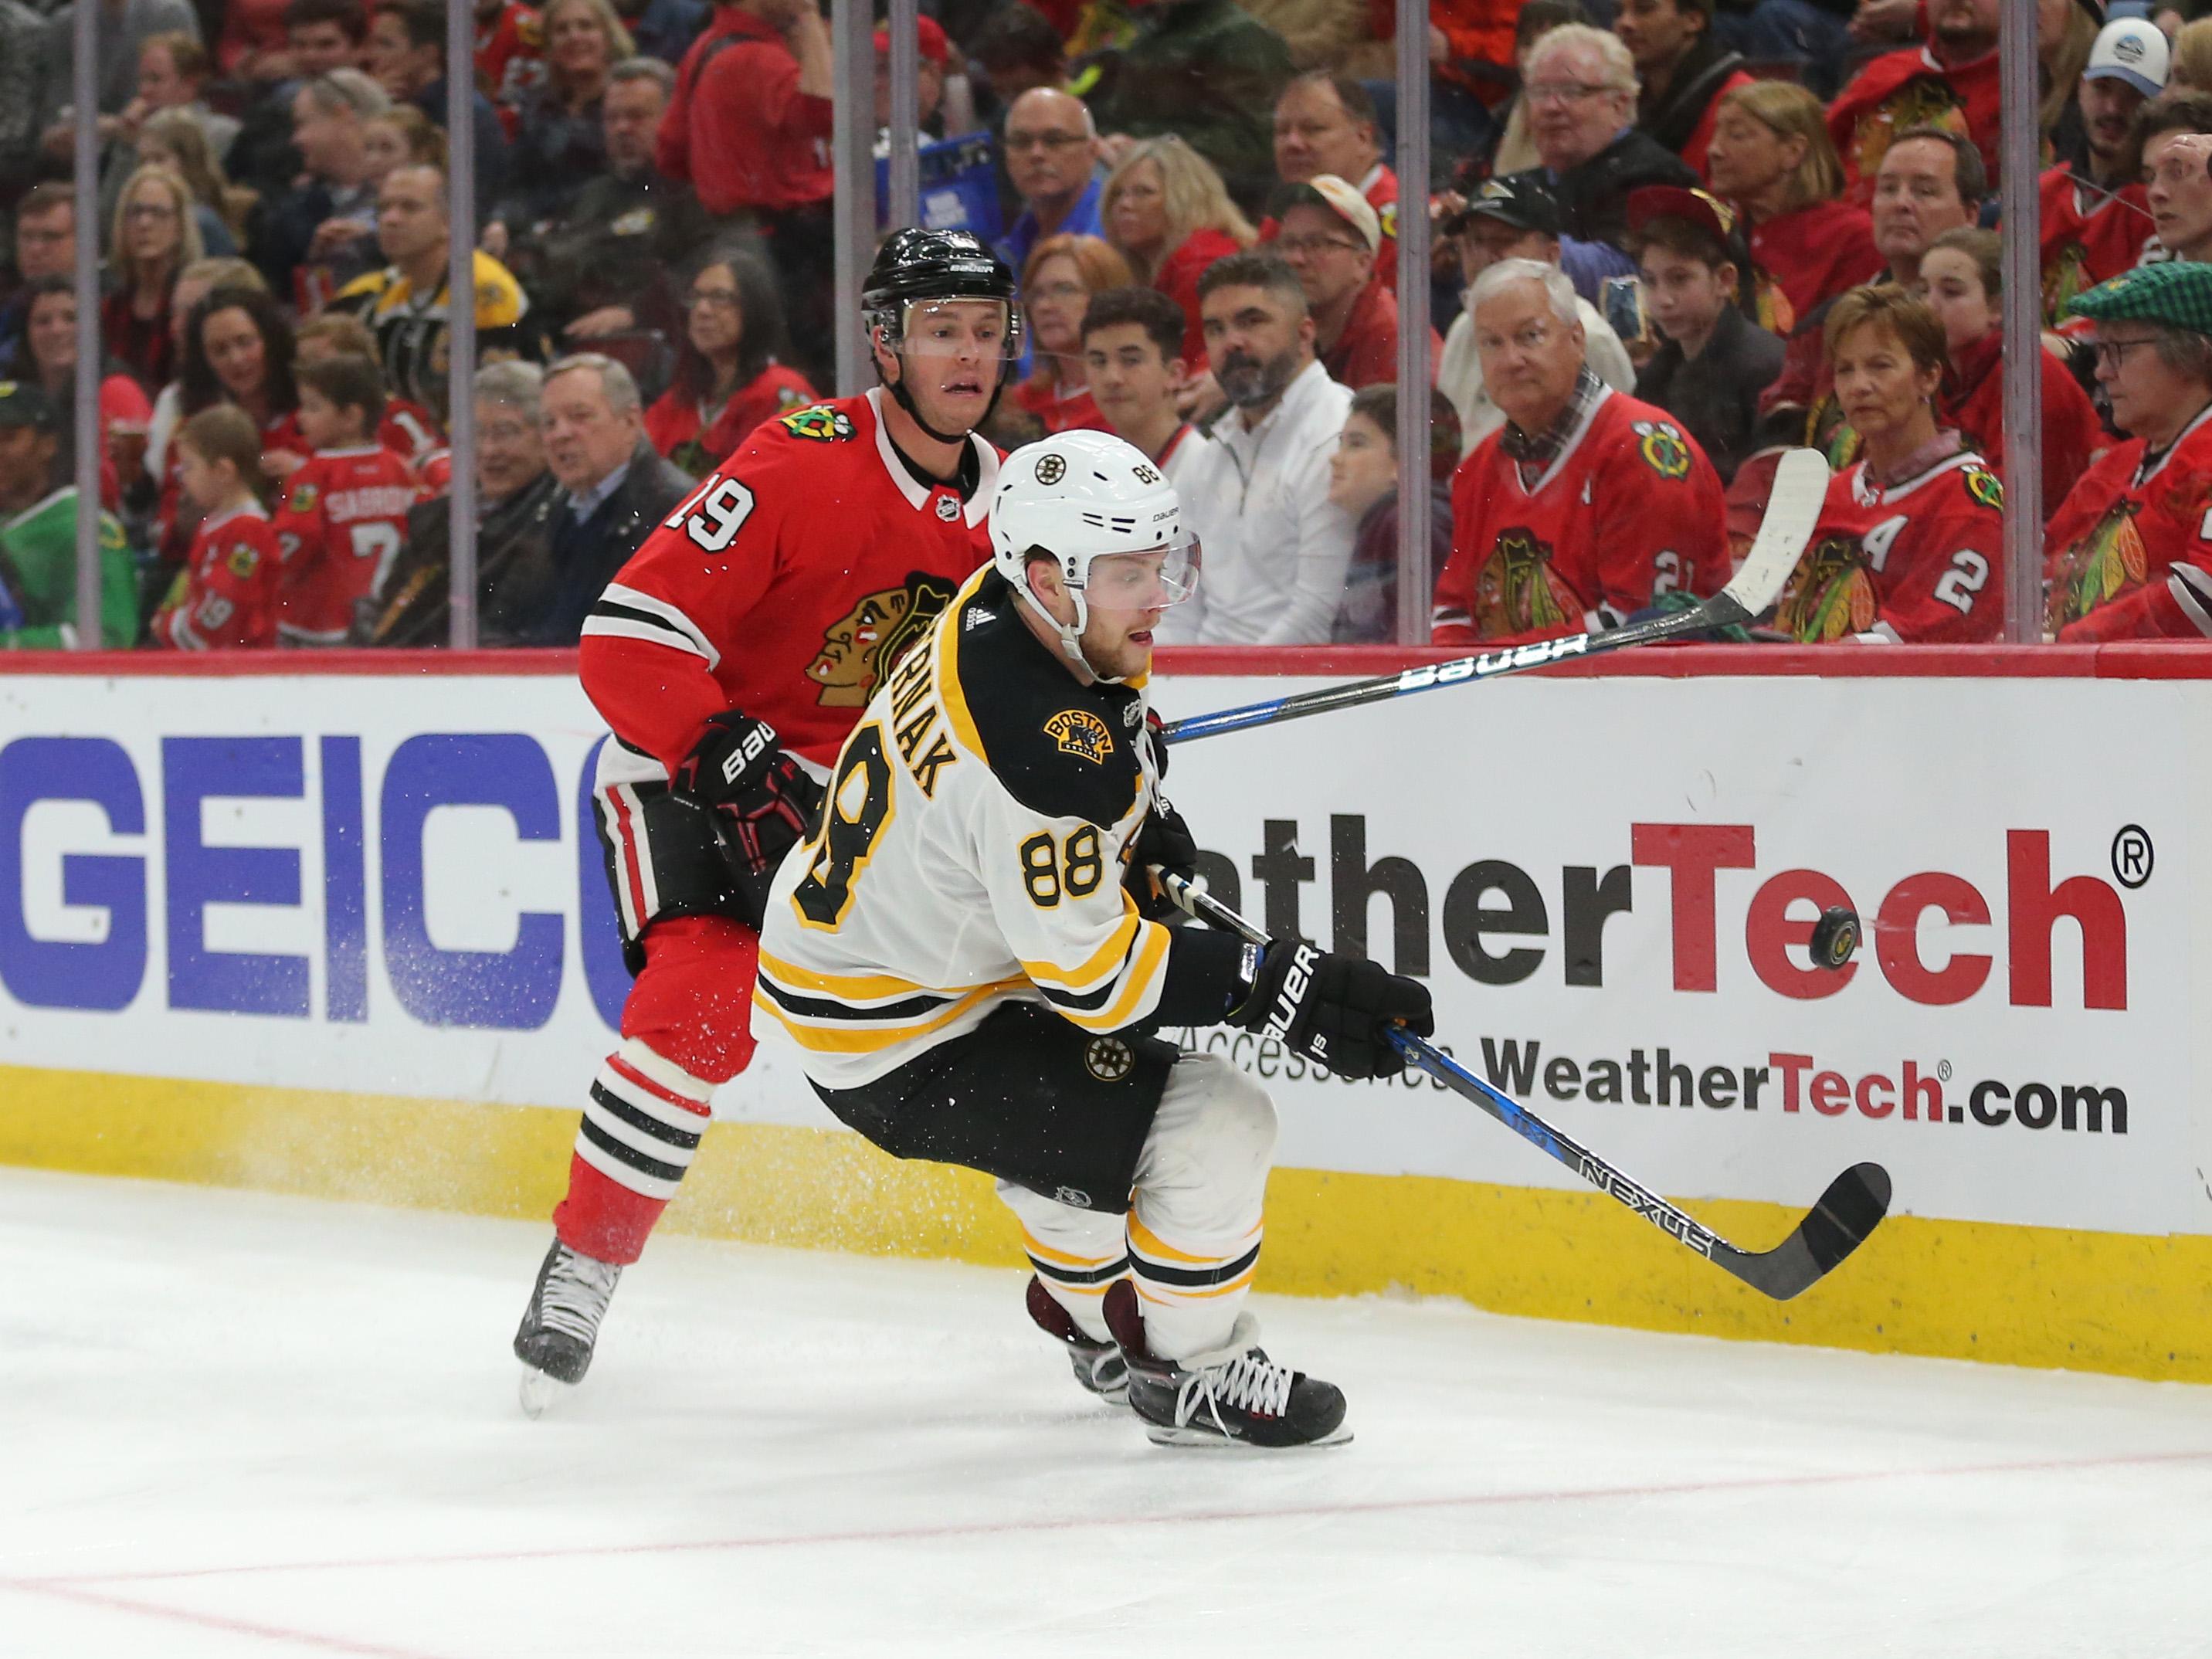 NHL: Boston Bruins at Chicago Blackhawks